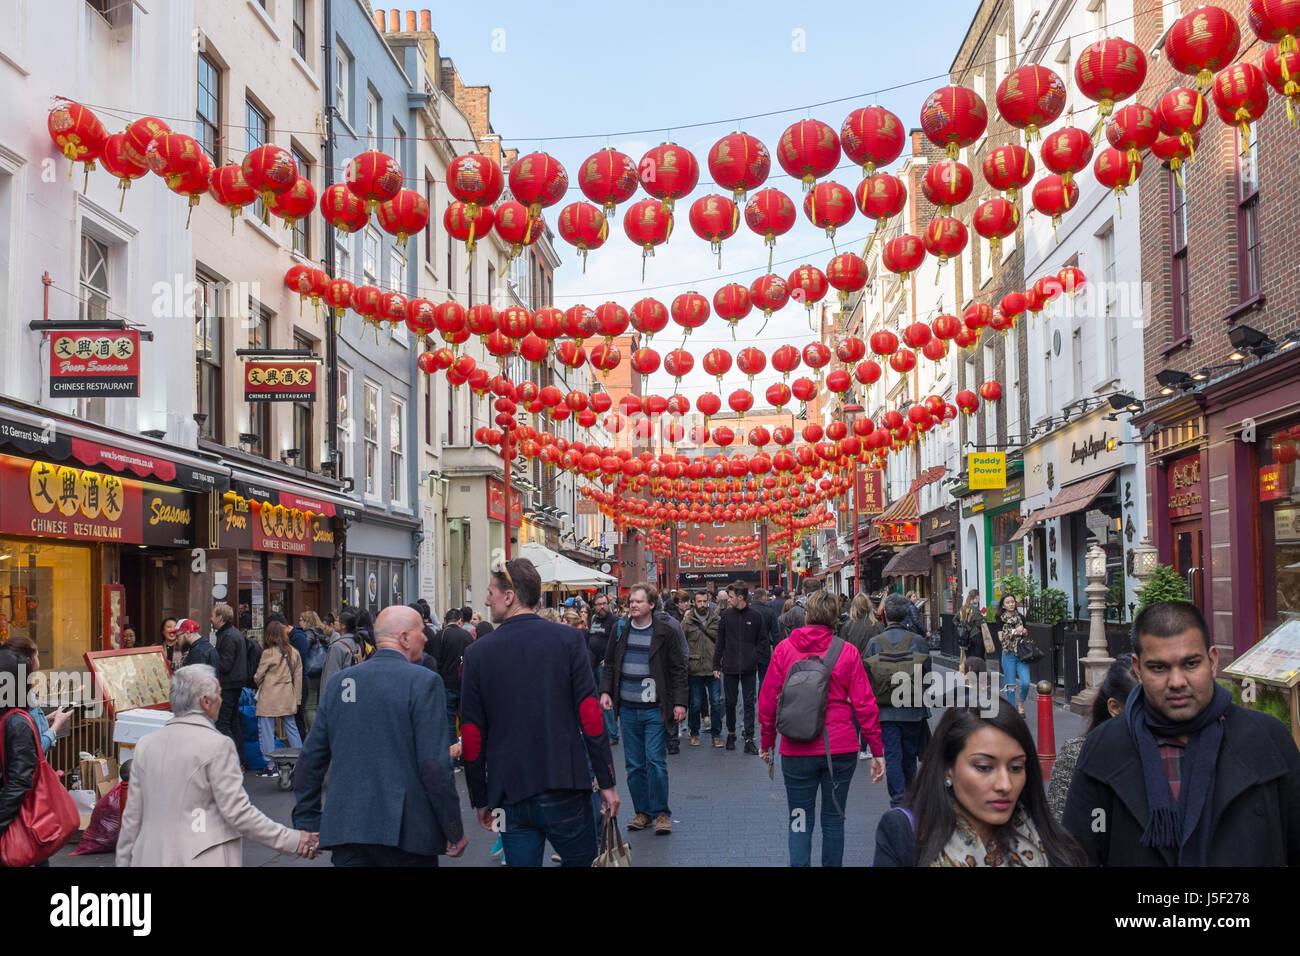 Chinese lanterns hanging above Wardour Street  in London's Chinatown - Stock Image